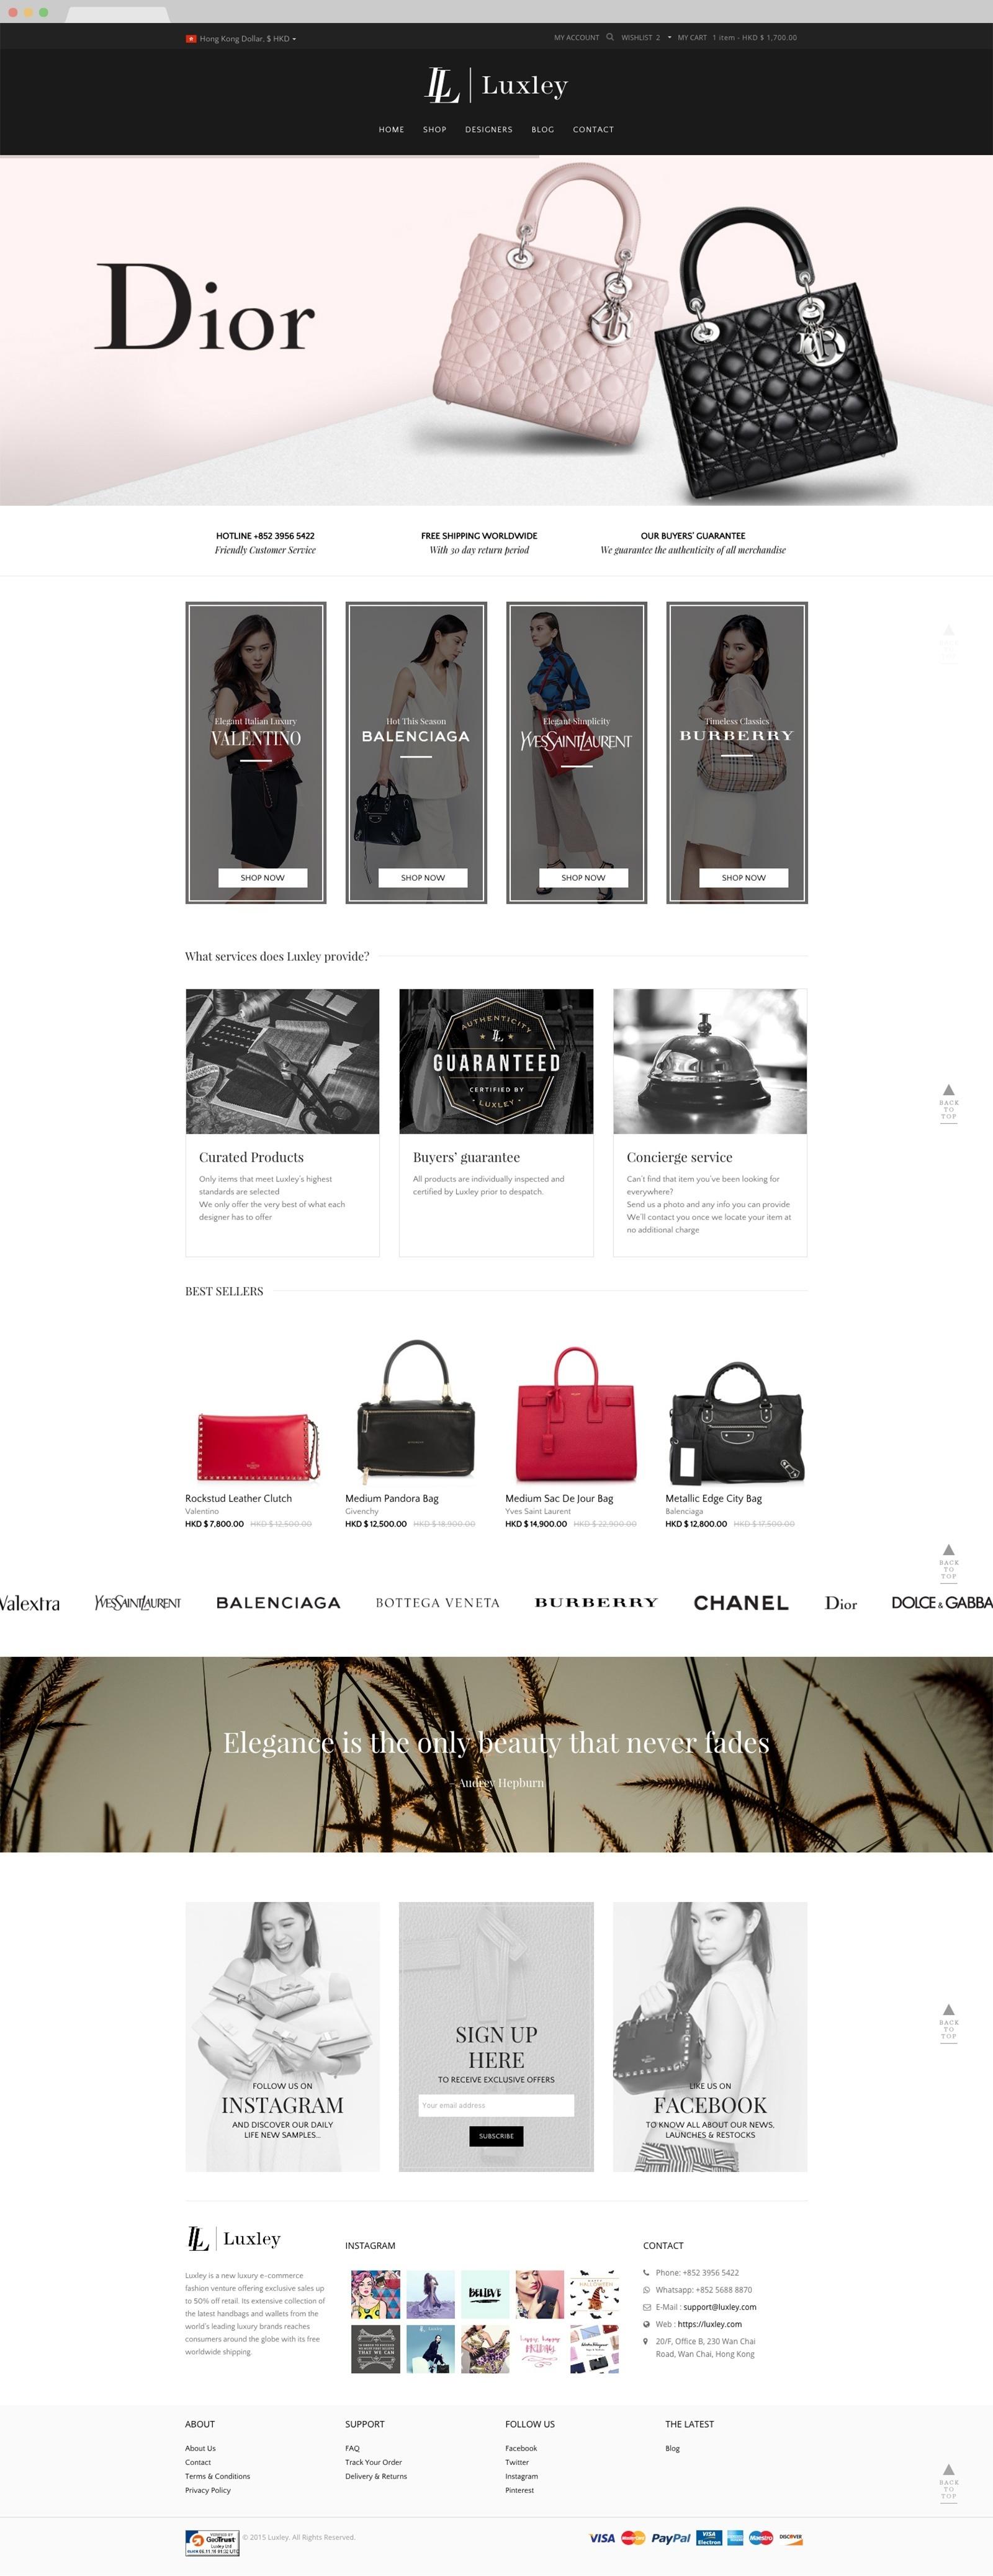 web design hk luxley 00